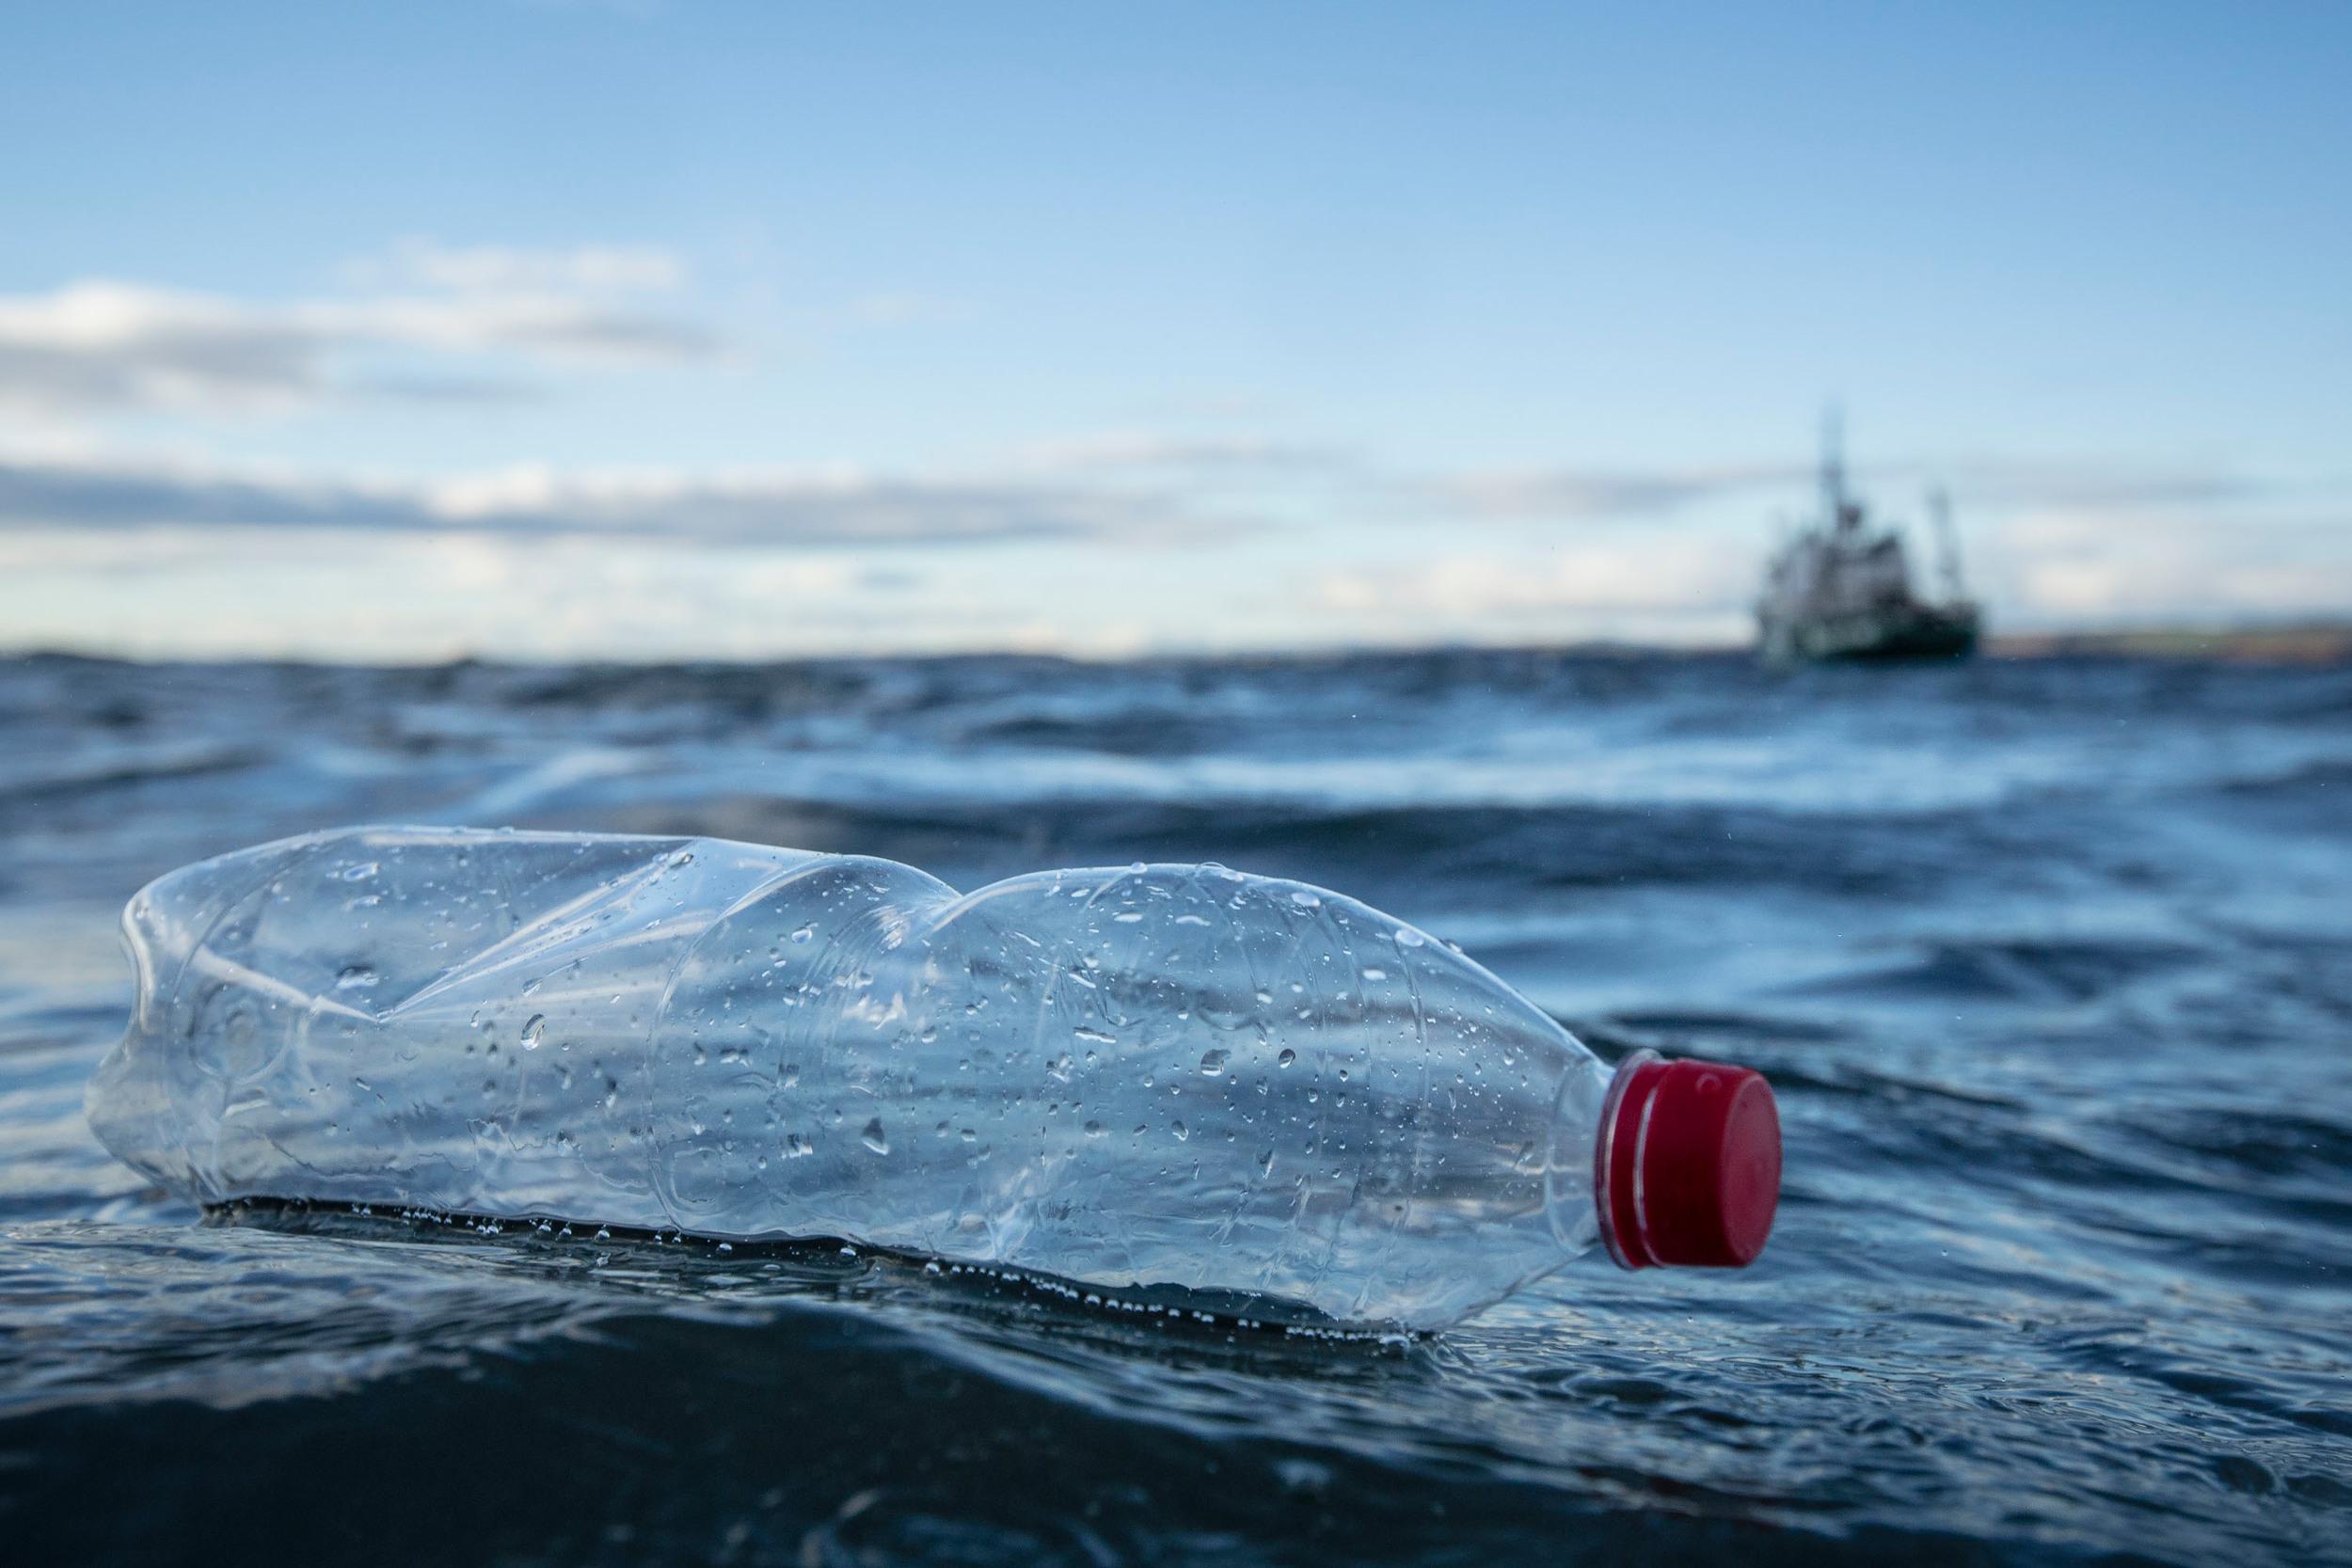 9 ways to reduce your plastic use | Greenpeace UK